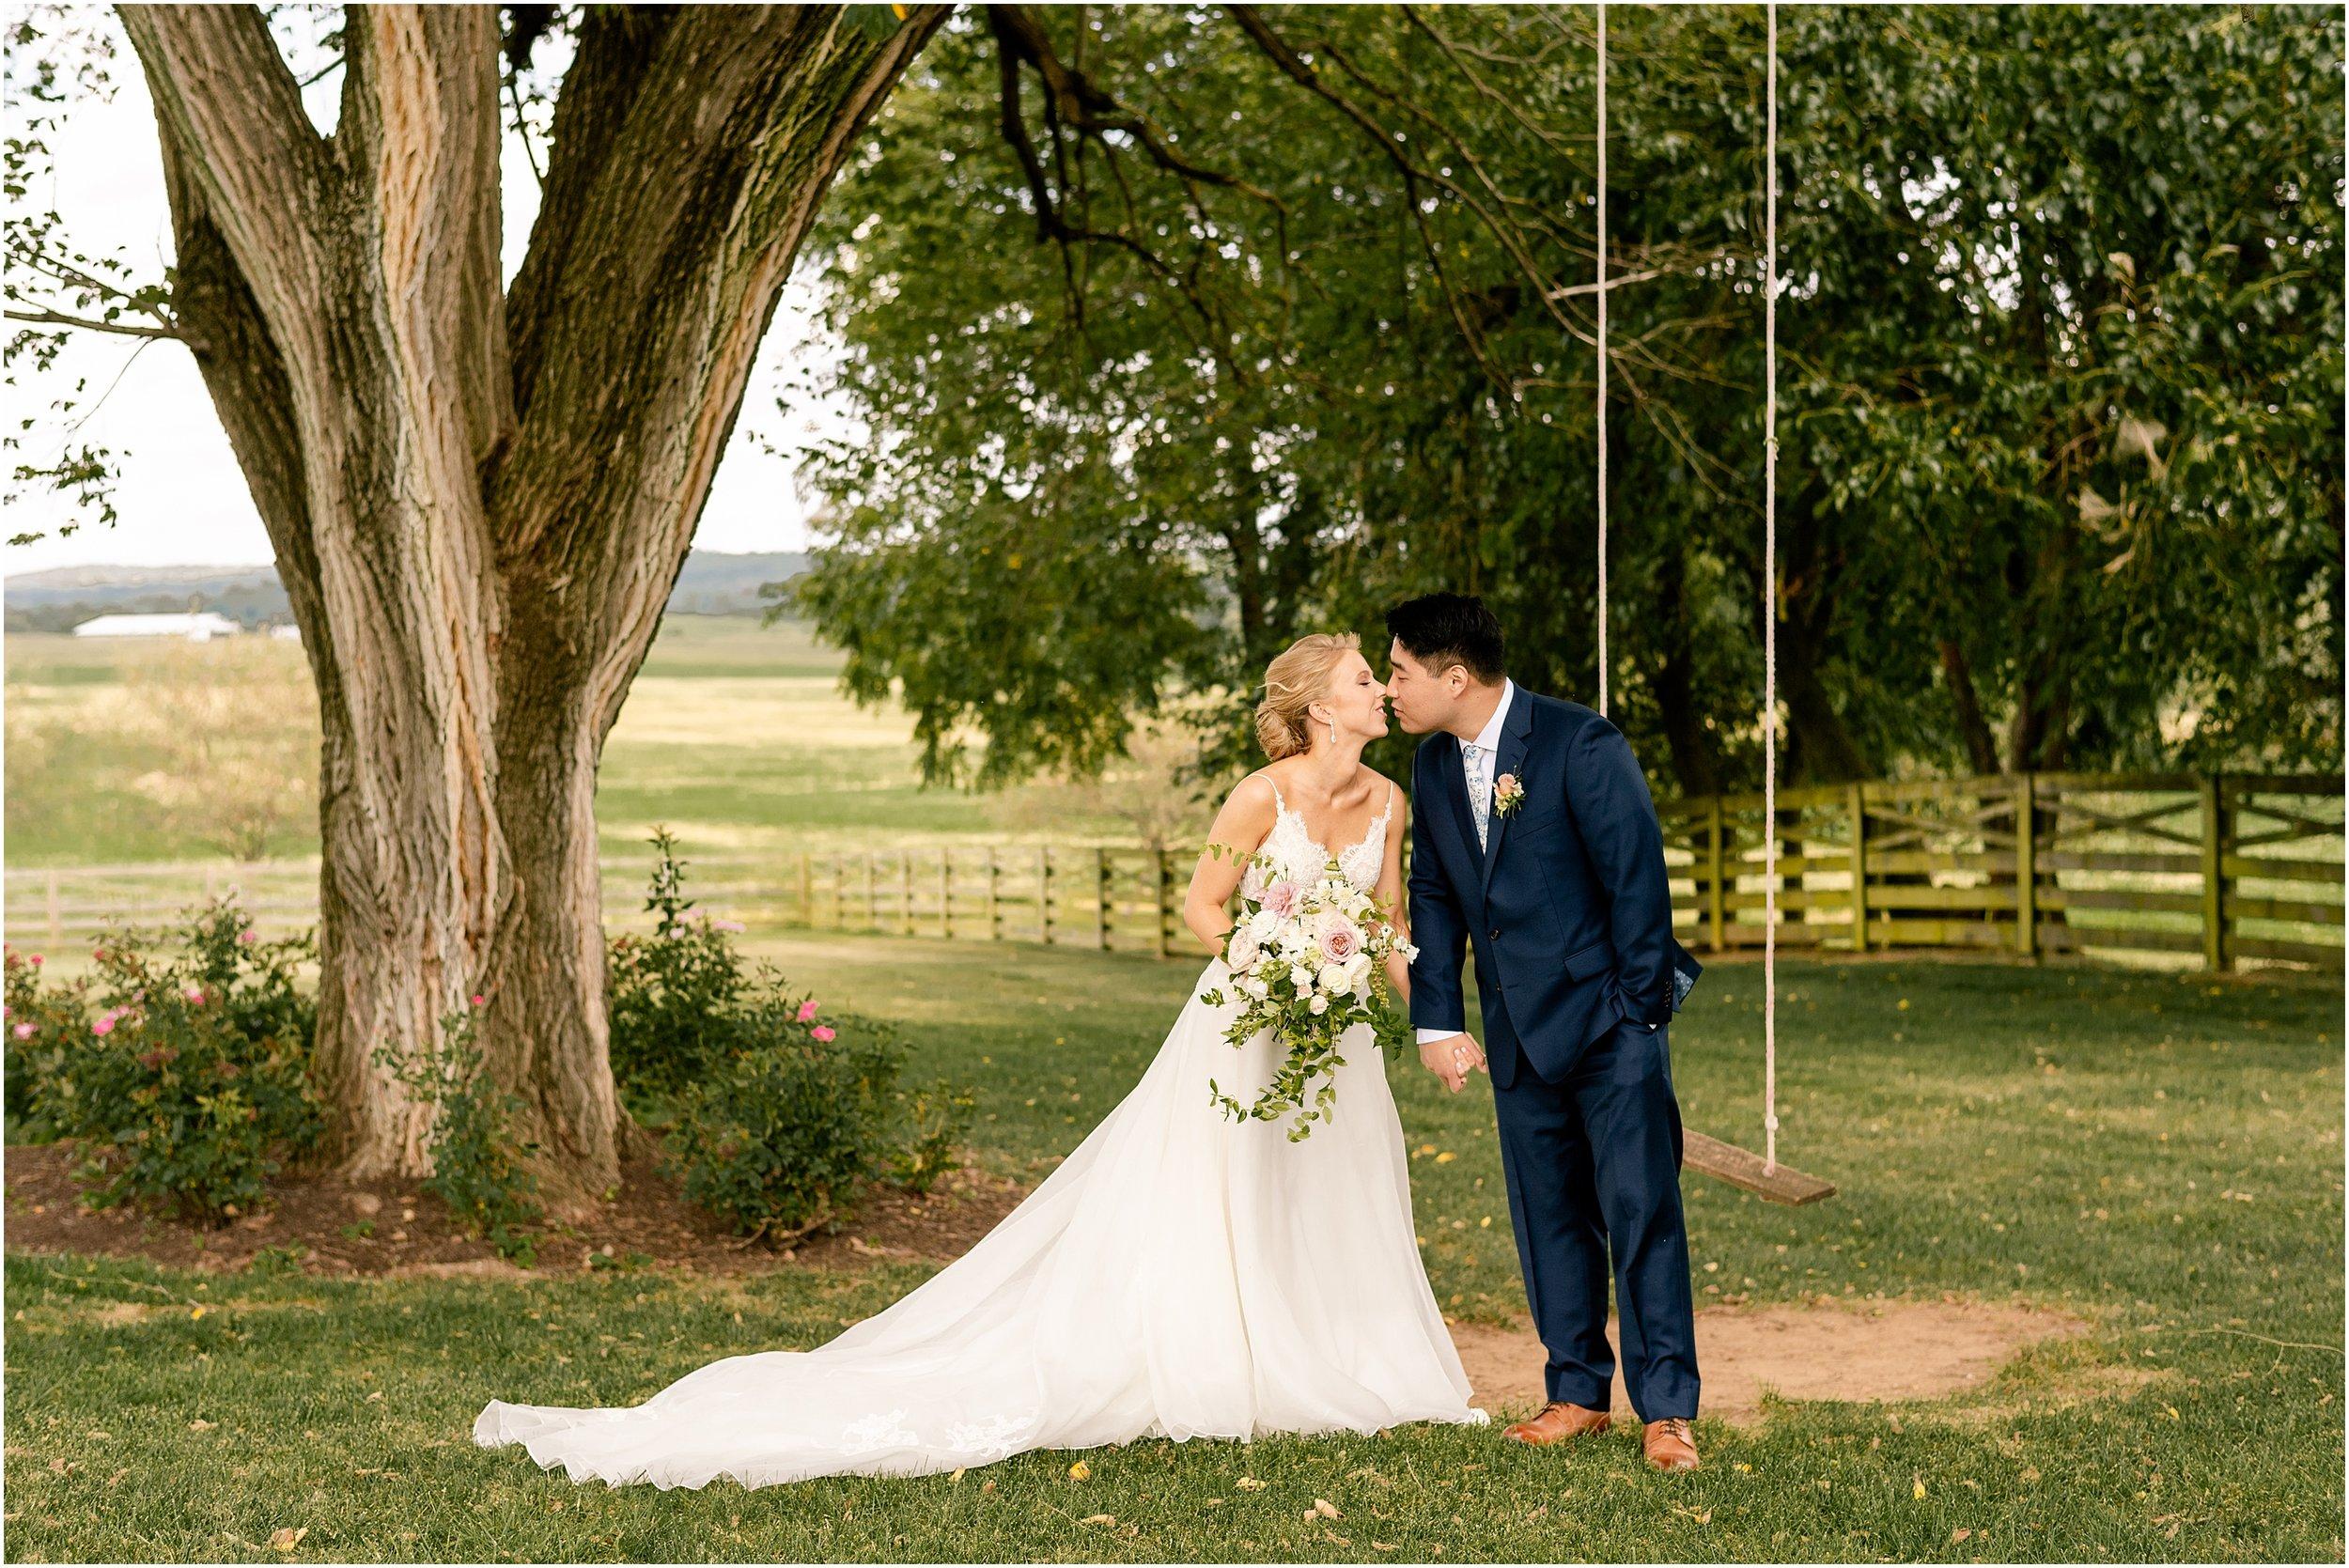 hannah leigh photography Walkers Overlook Wedding Walkersville MD_3505.jpg